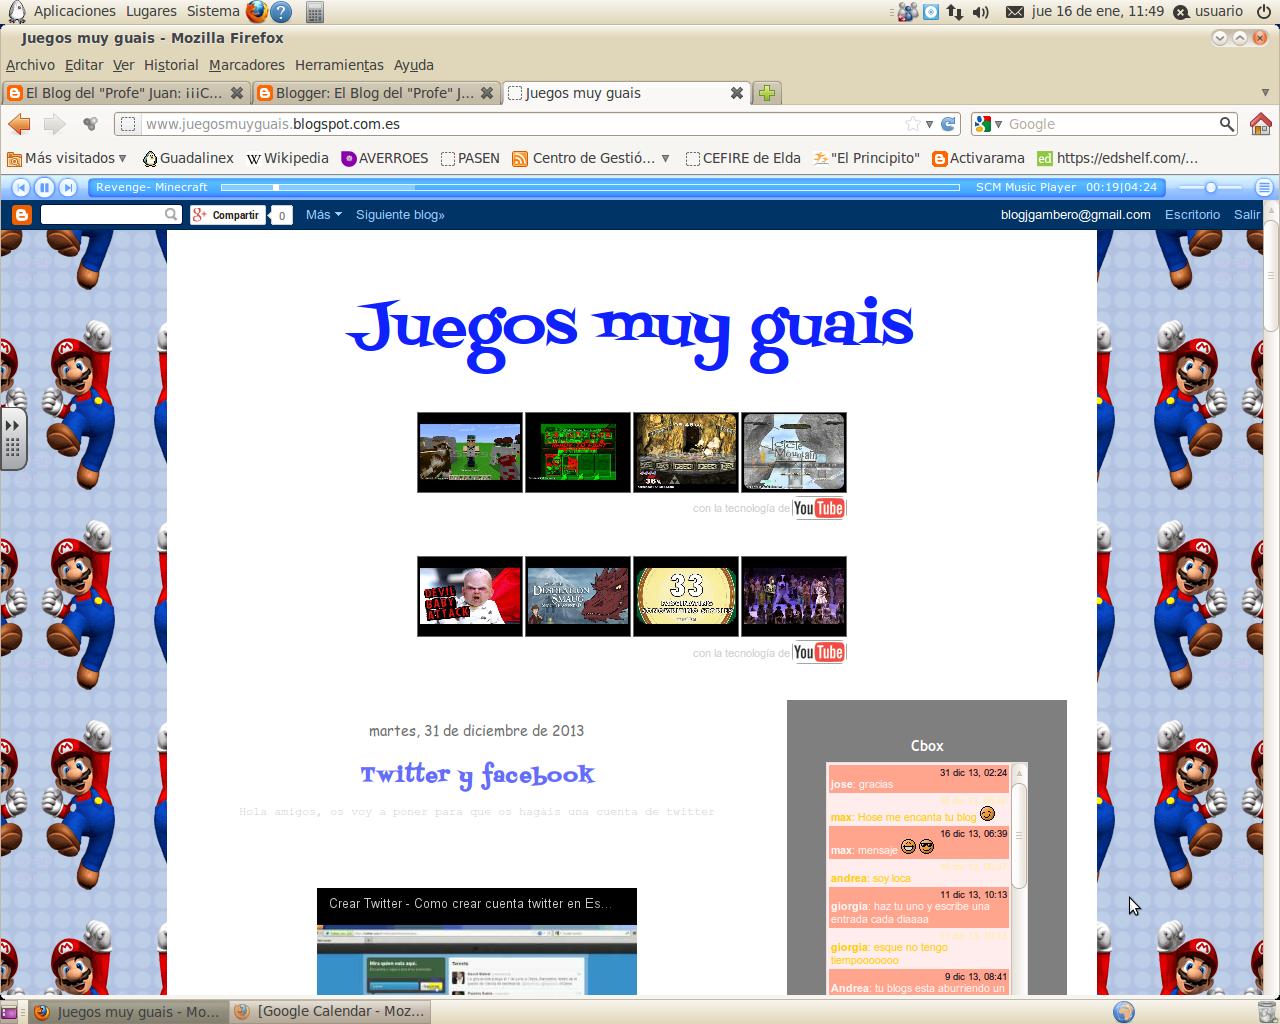 http://juegosmuyguais.blogspot.com.es/